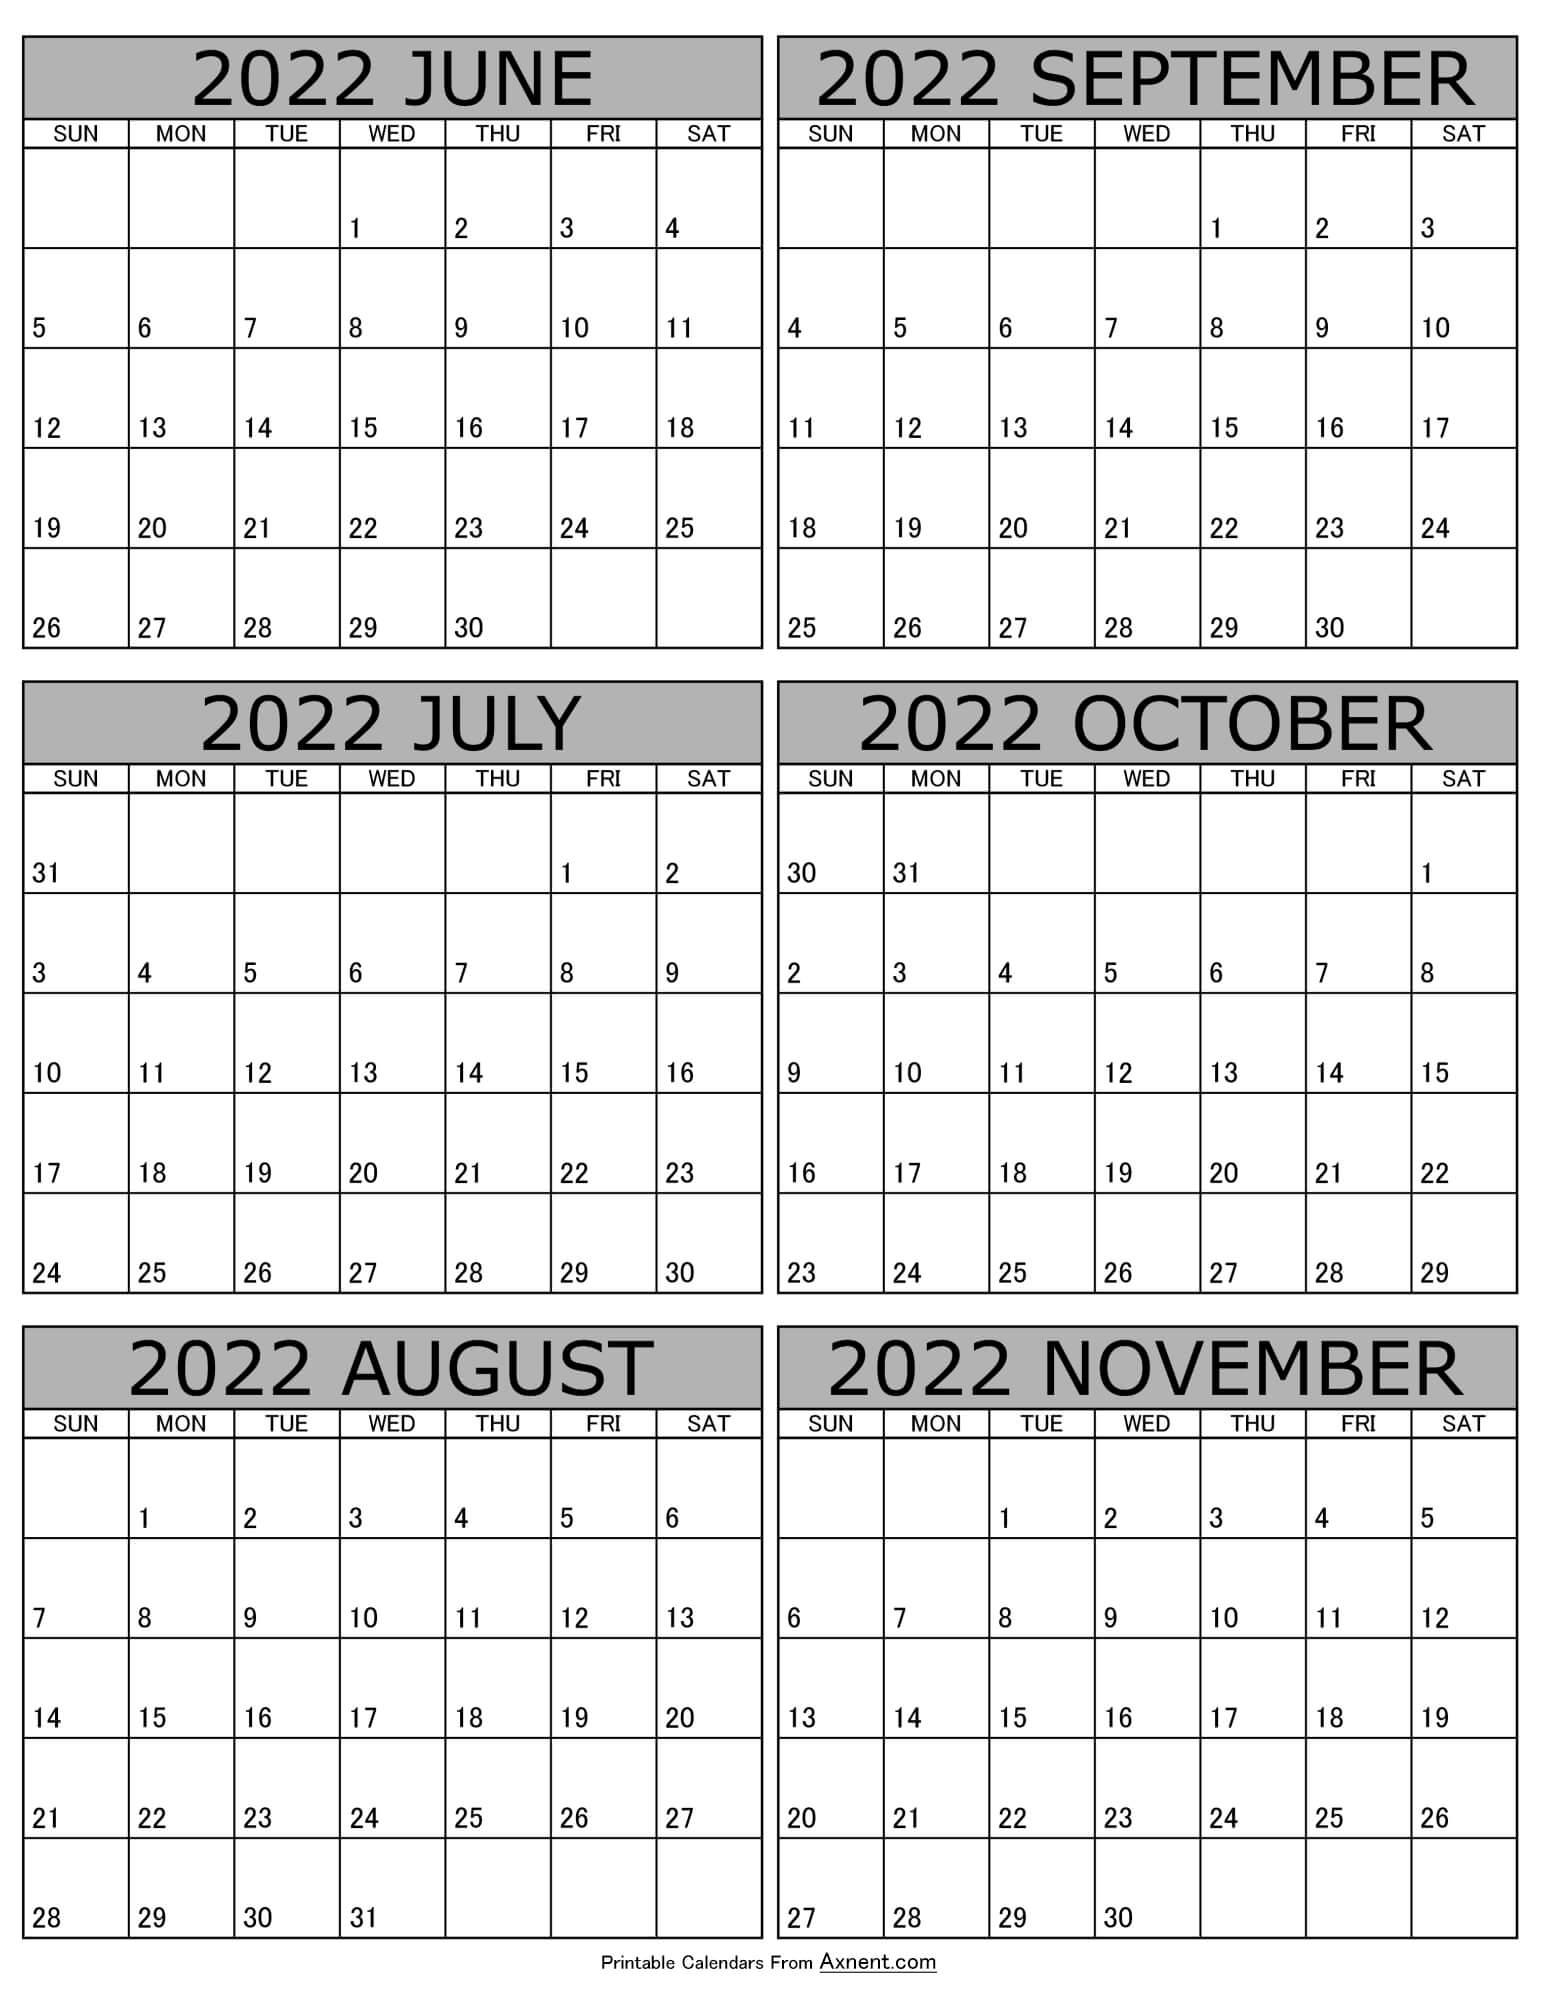 Calendar 2022 June to November